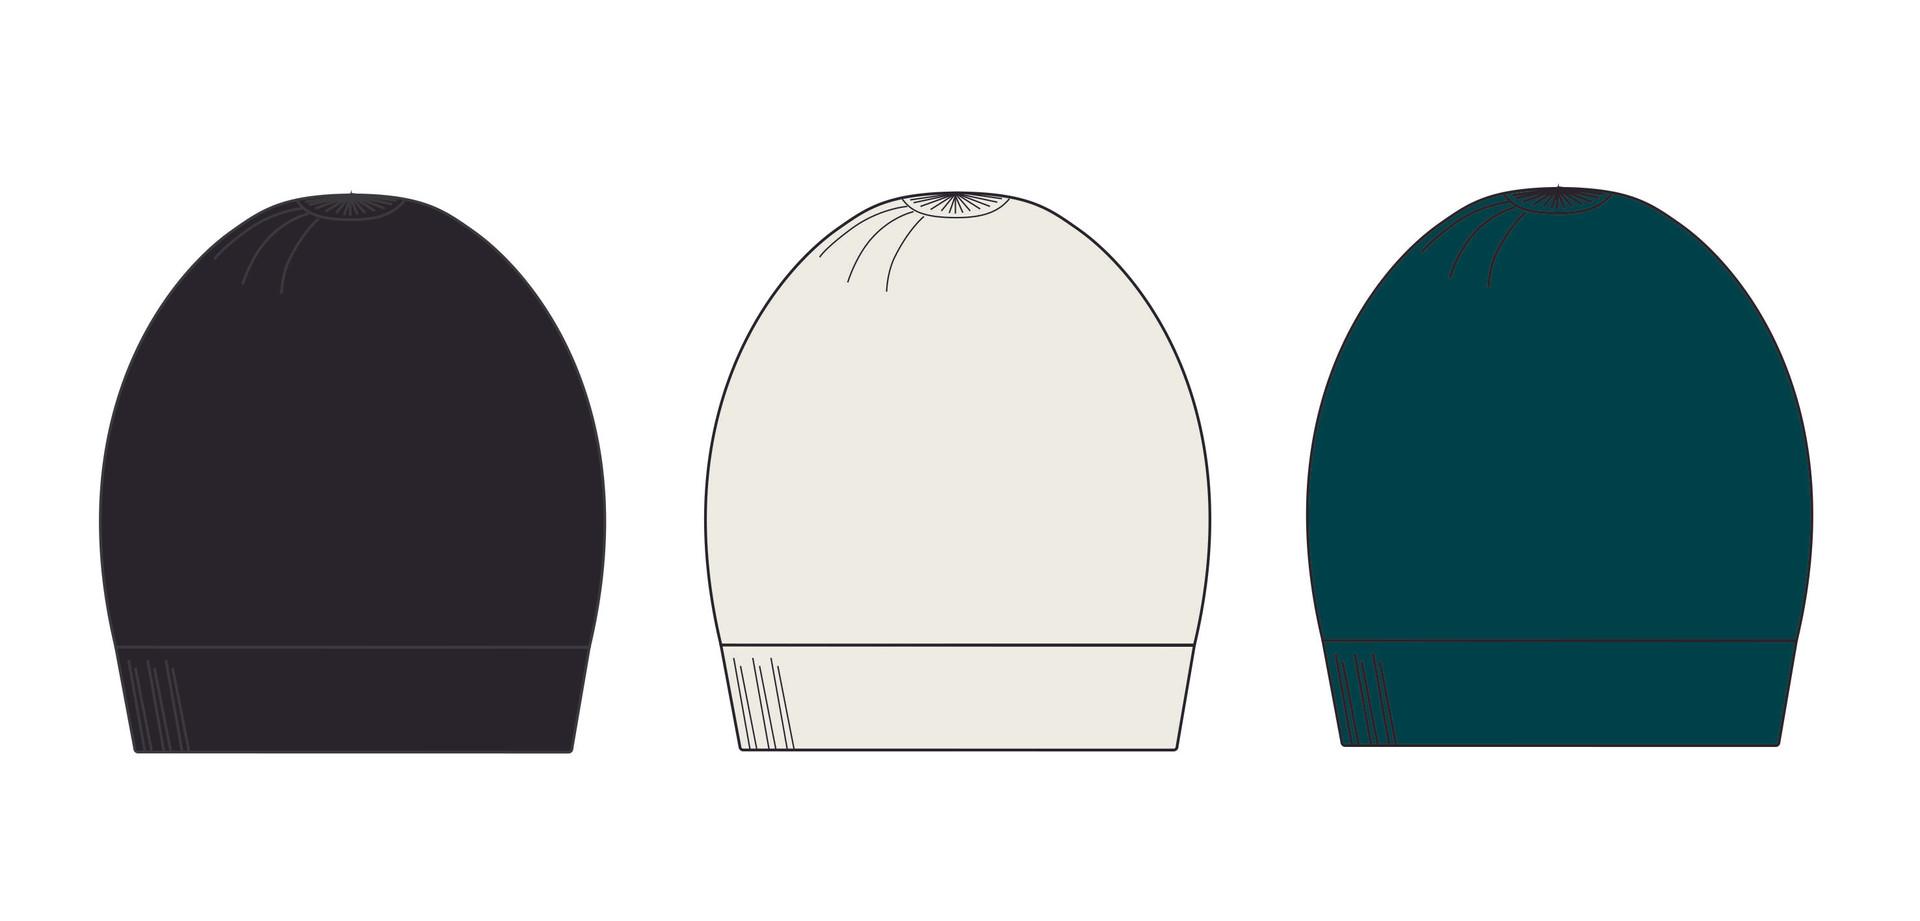 Käpy-pipo, värit 2020